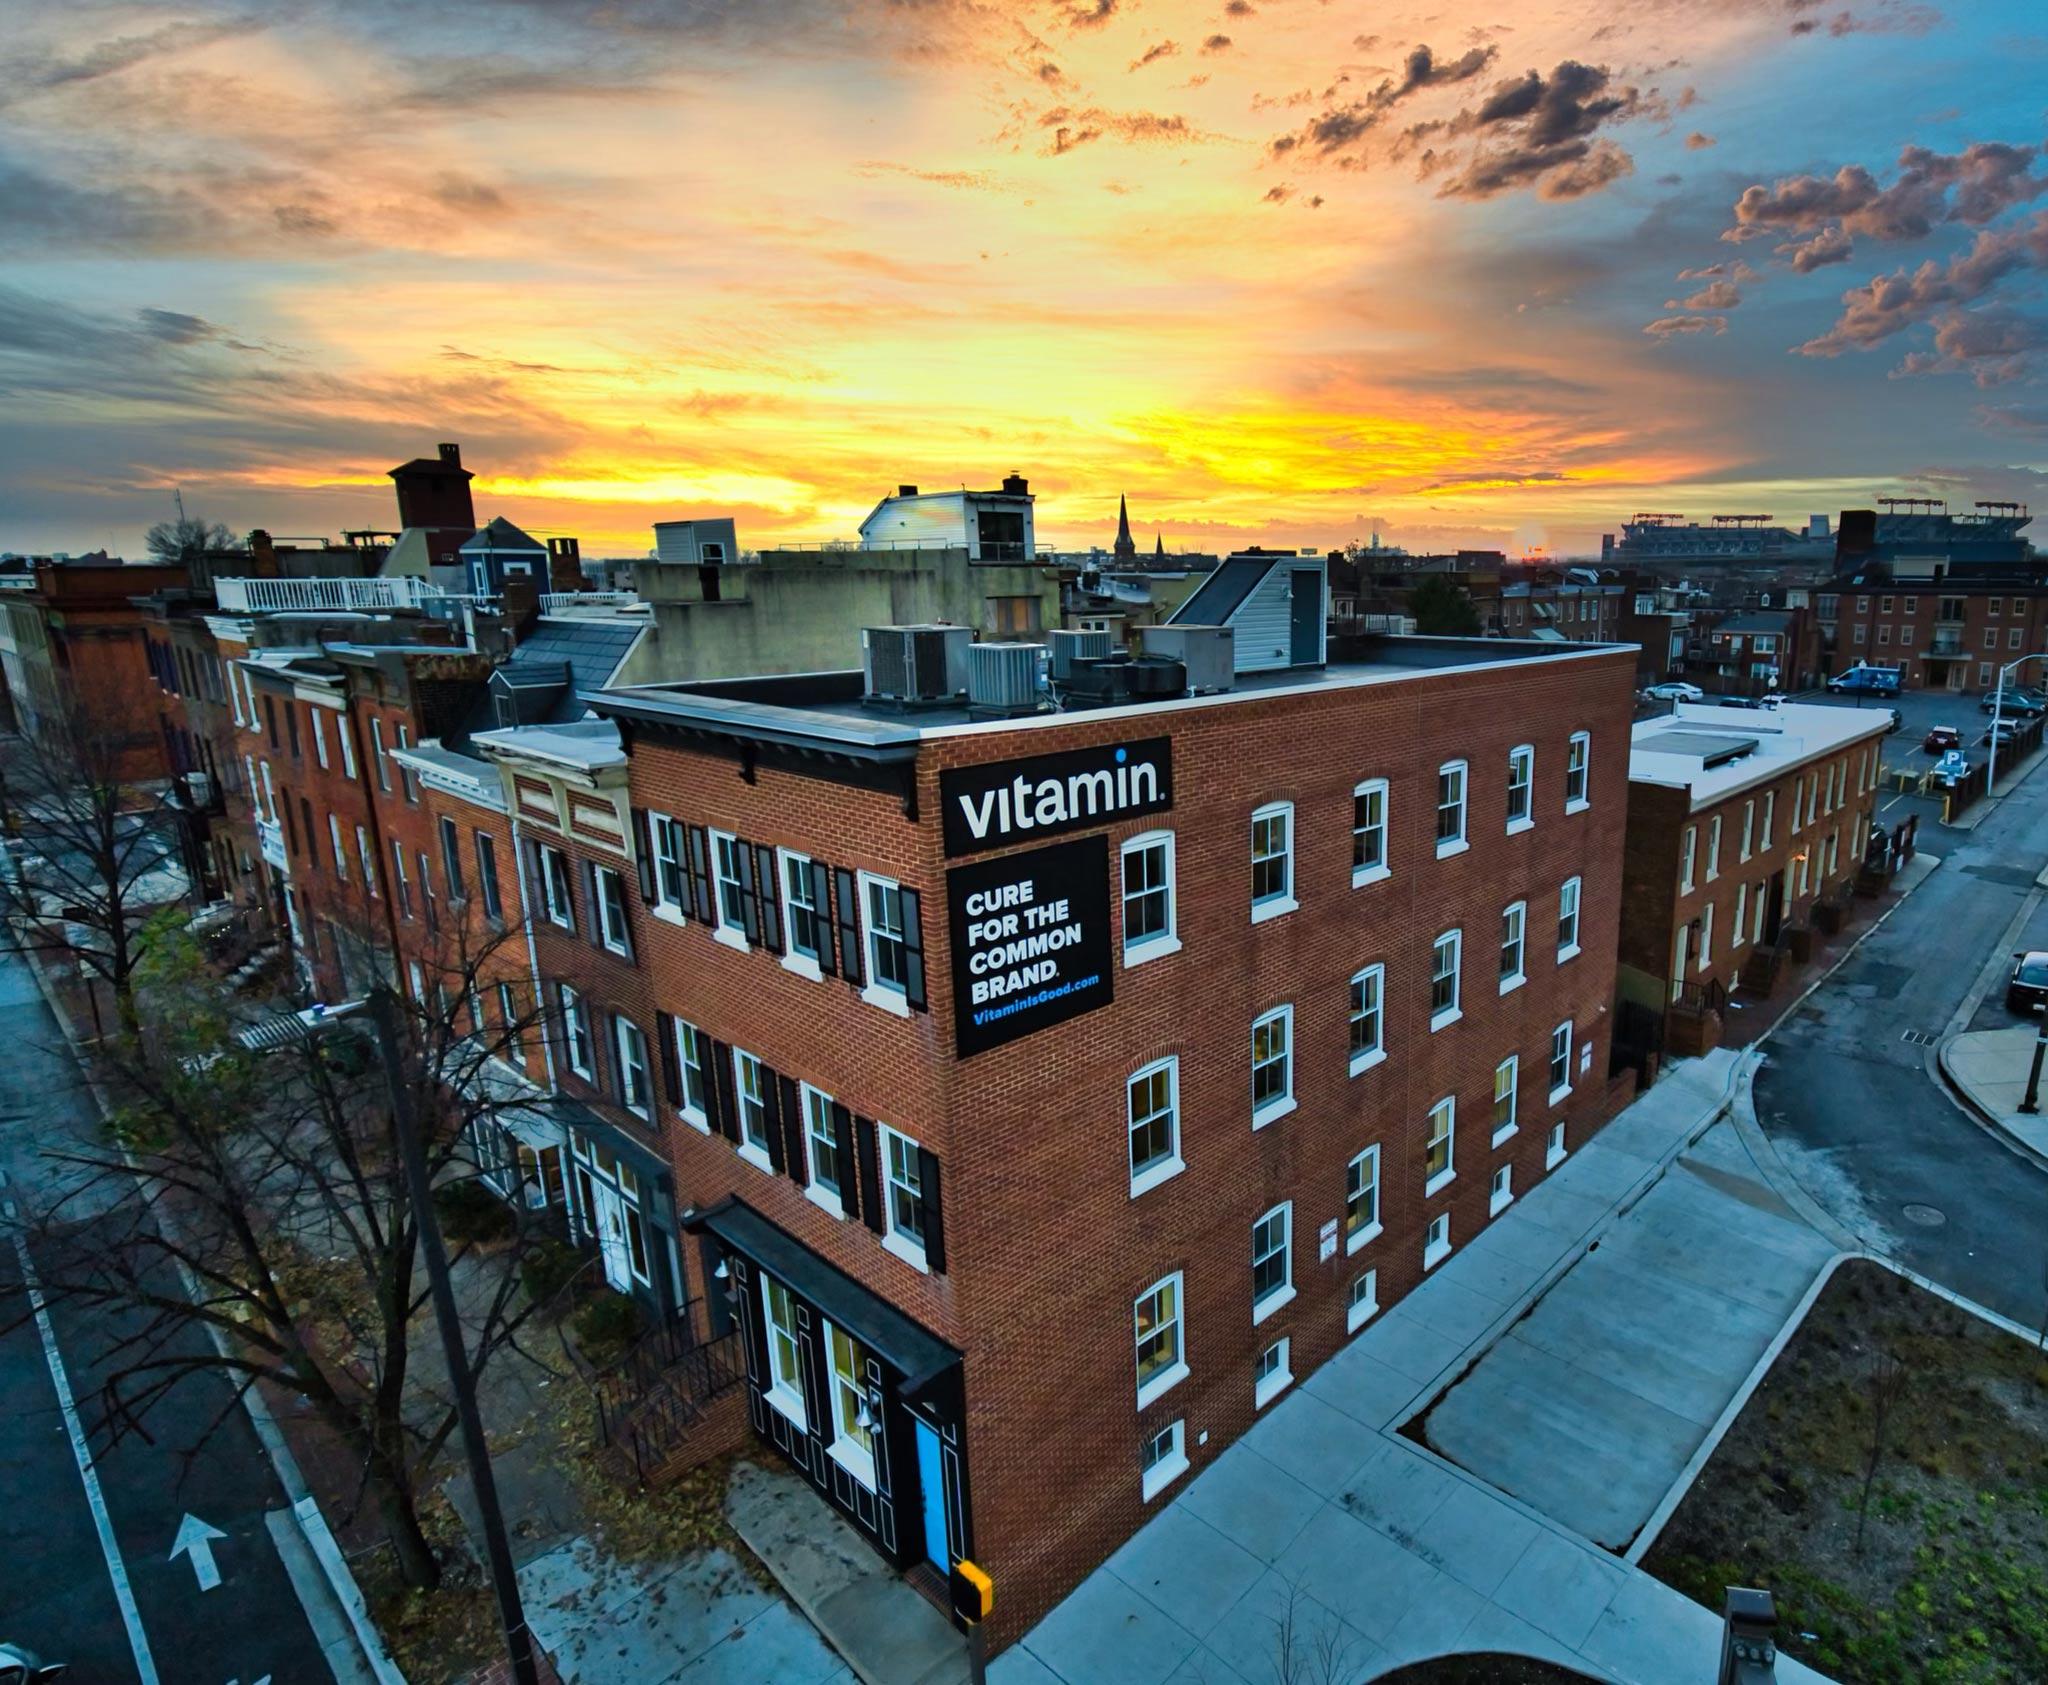 POV photo of Vitamin building at sunset